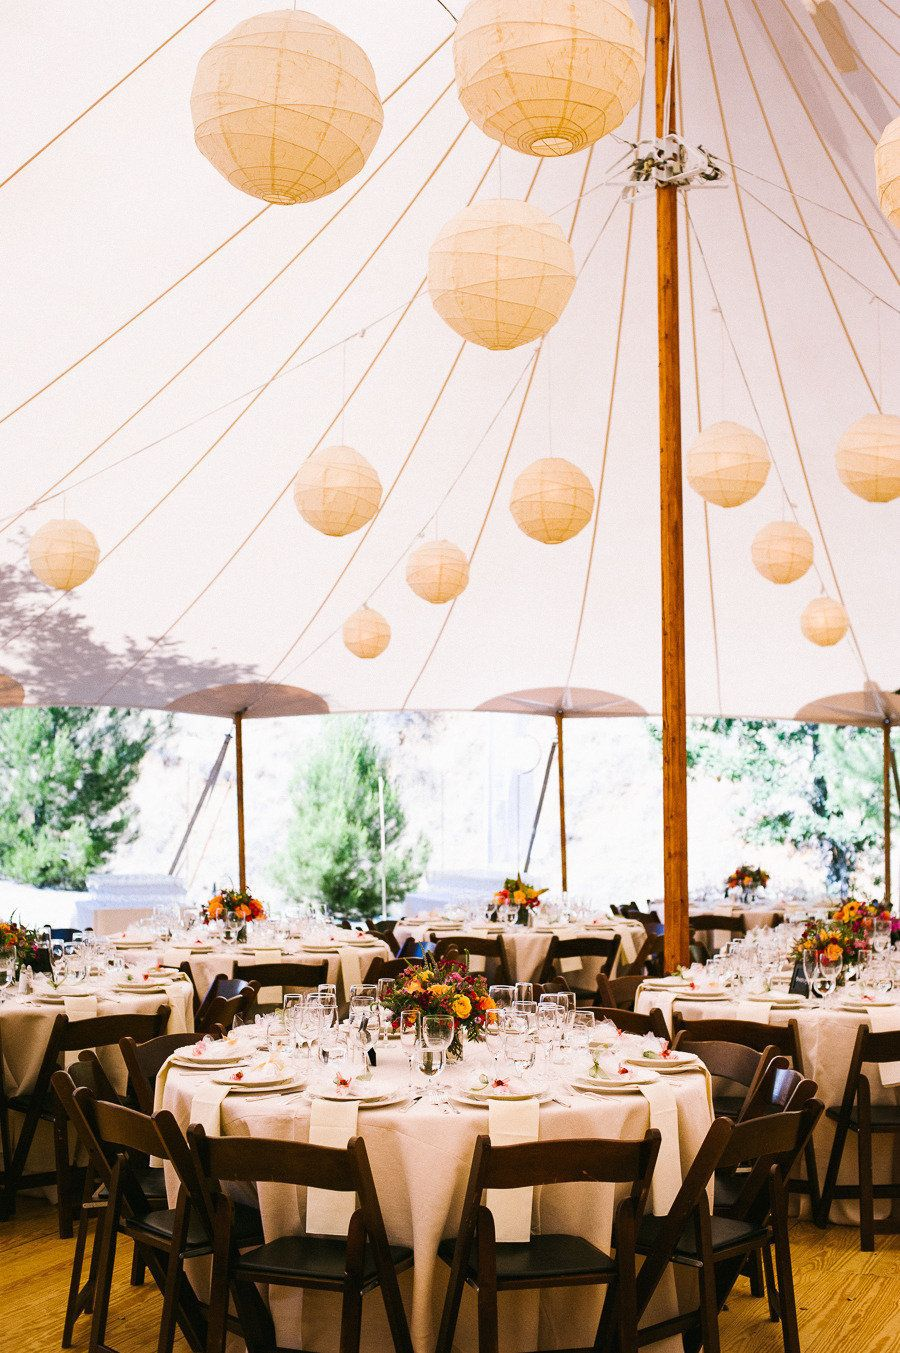 California Vineyard Wedding from Docuvitae | Tents, Rounding and ...